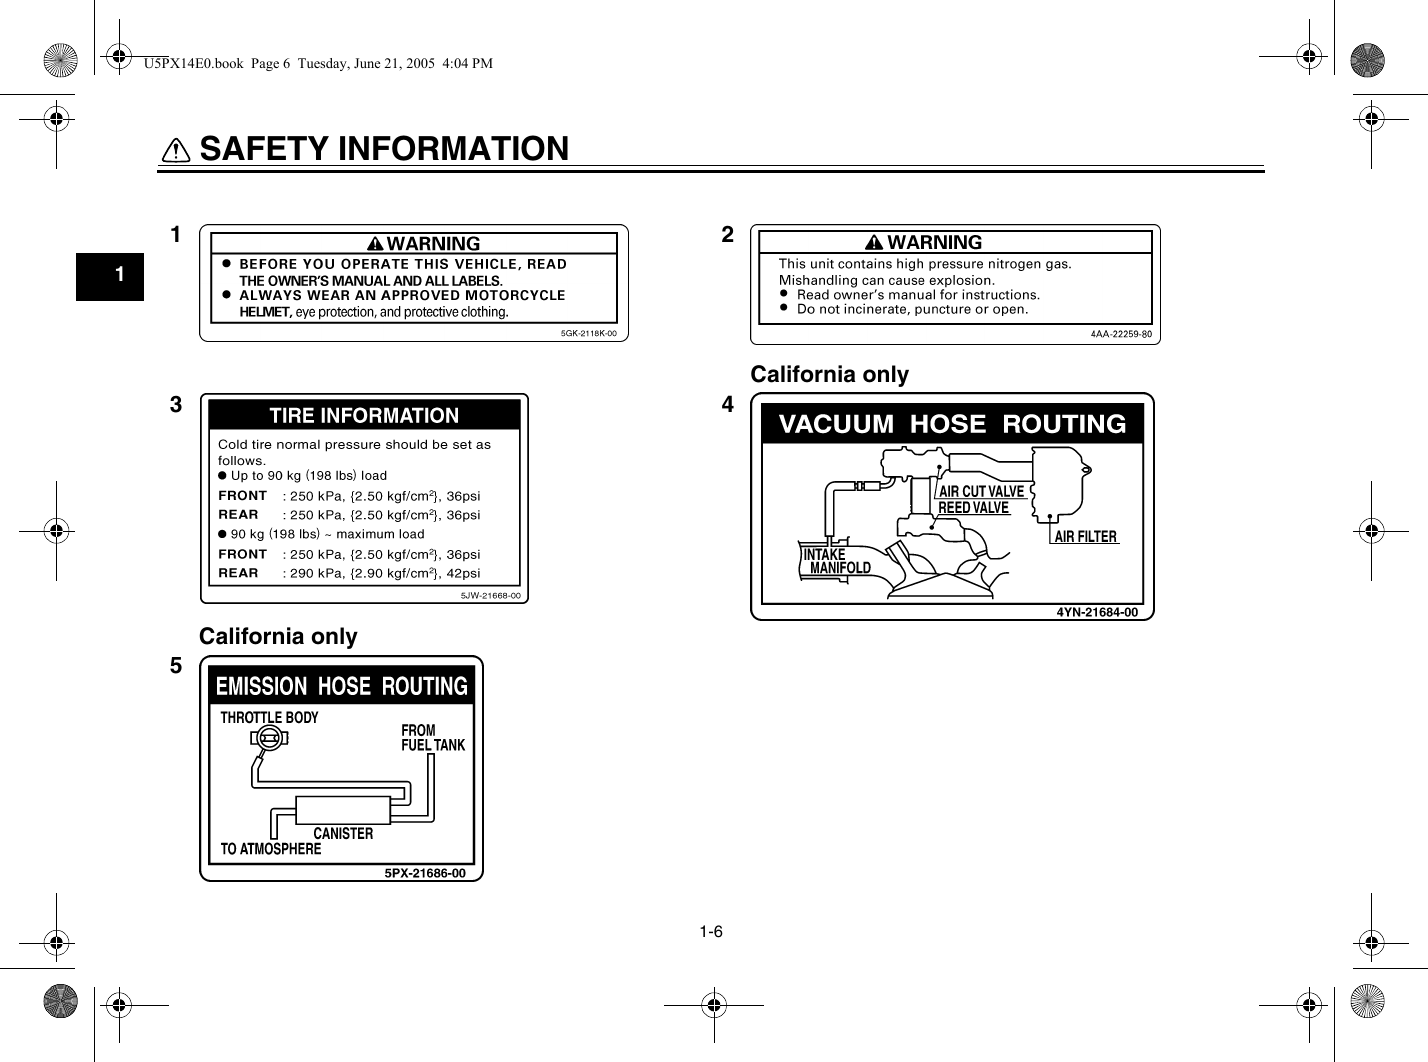 Yamaha 2006 Midnight Warrior Owners Manual on